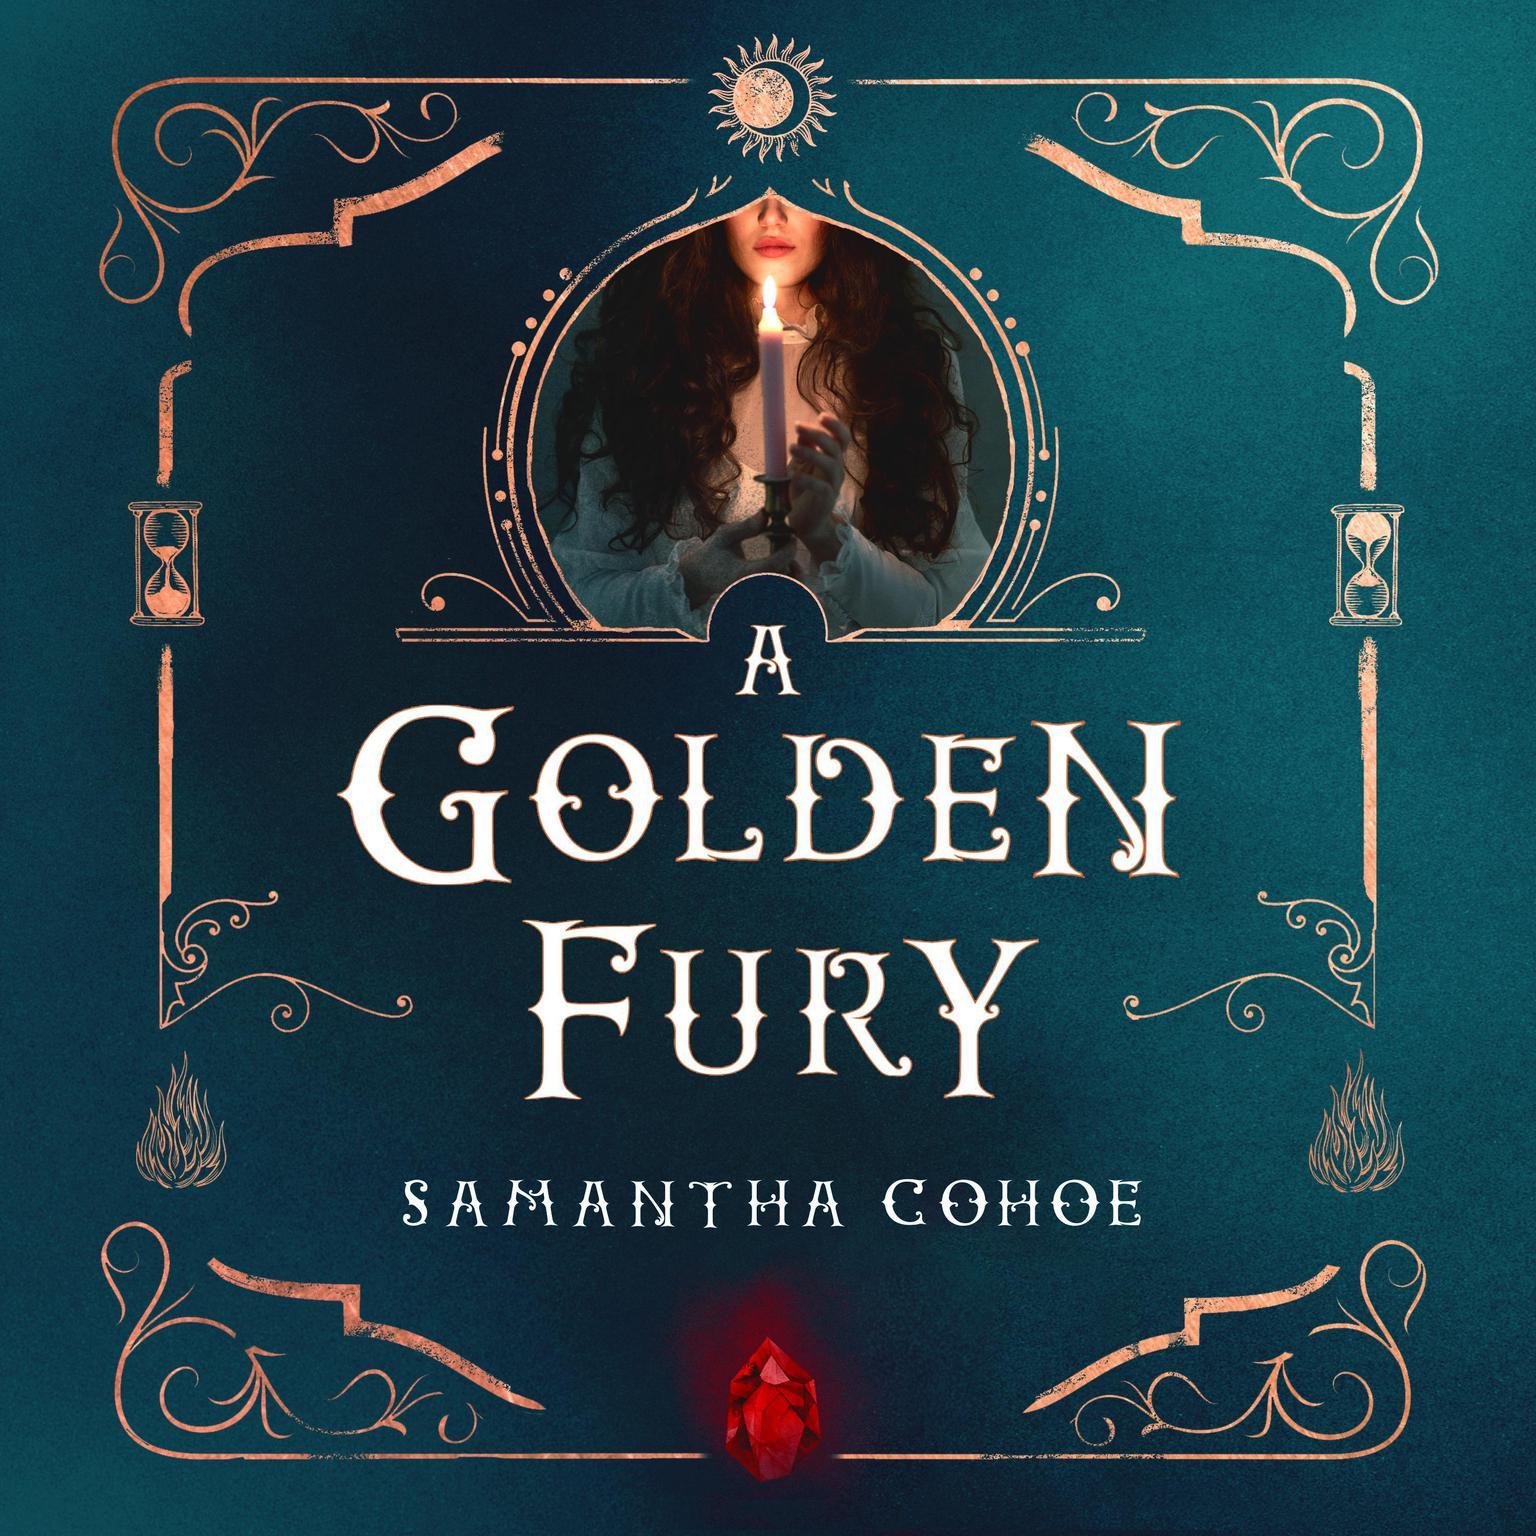 A Golden Fury: A Novel Audiobook, by Samantha Cohoe